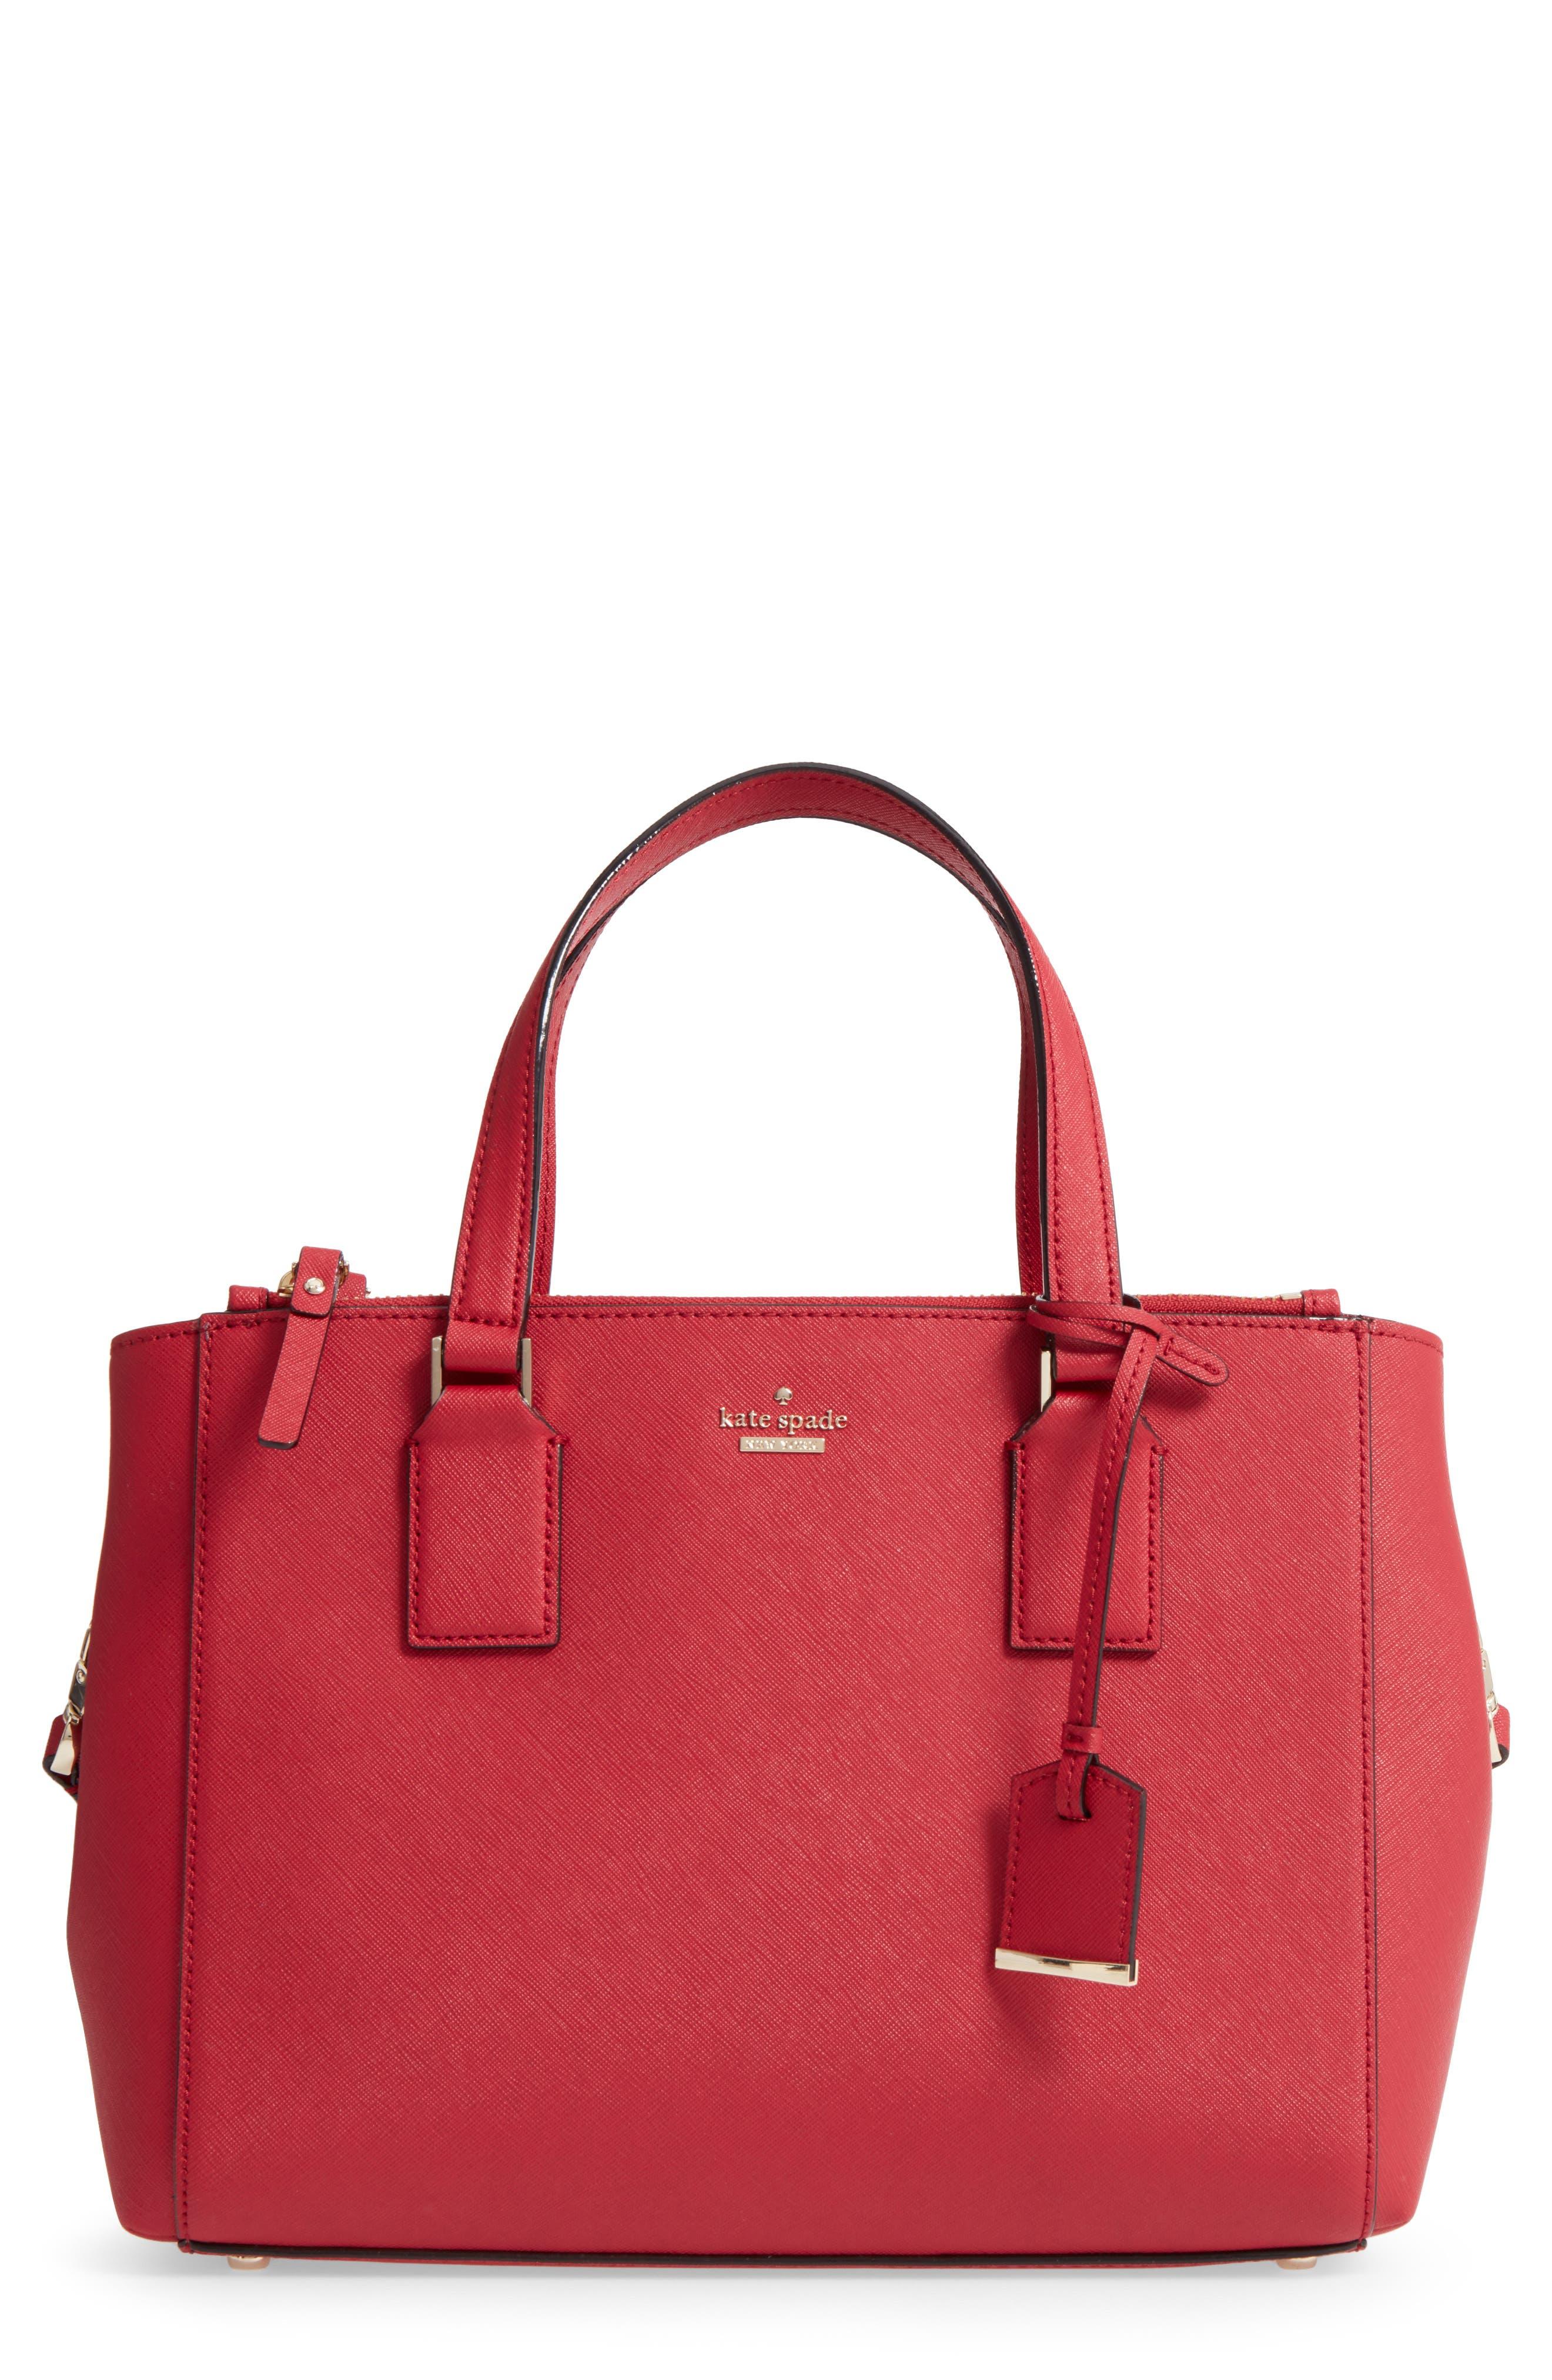 cameron street - teegan calfskin leather satchel,                         Main,                         color, 638